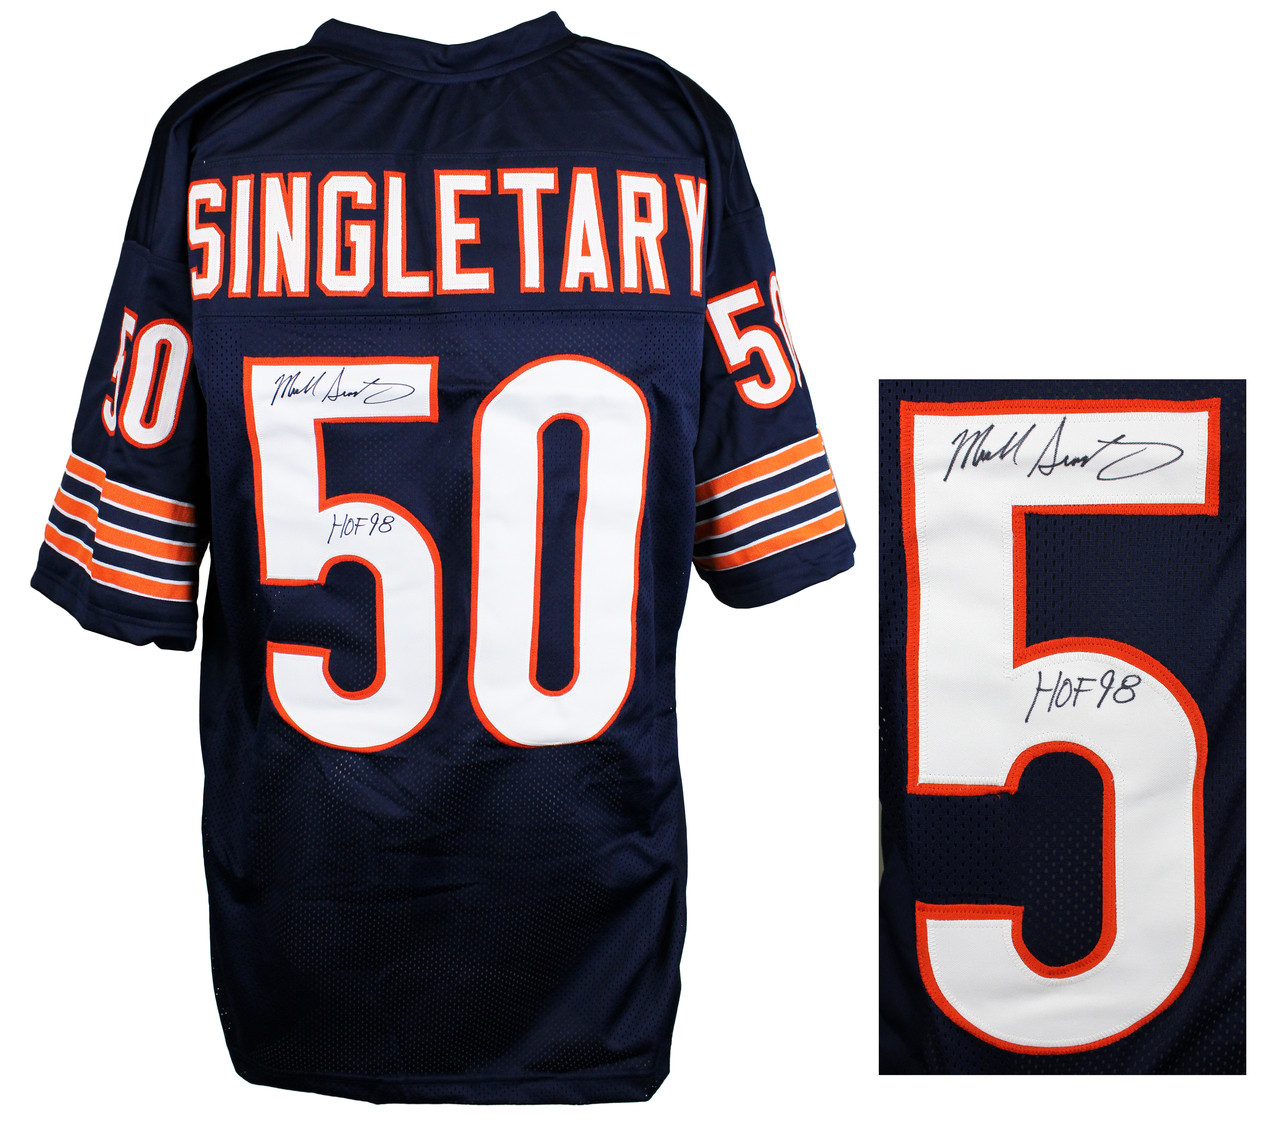 pretty nice dae08 178b1 Mike Singletary Signed Navy Custom Jersey w/HOF 98